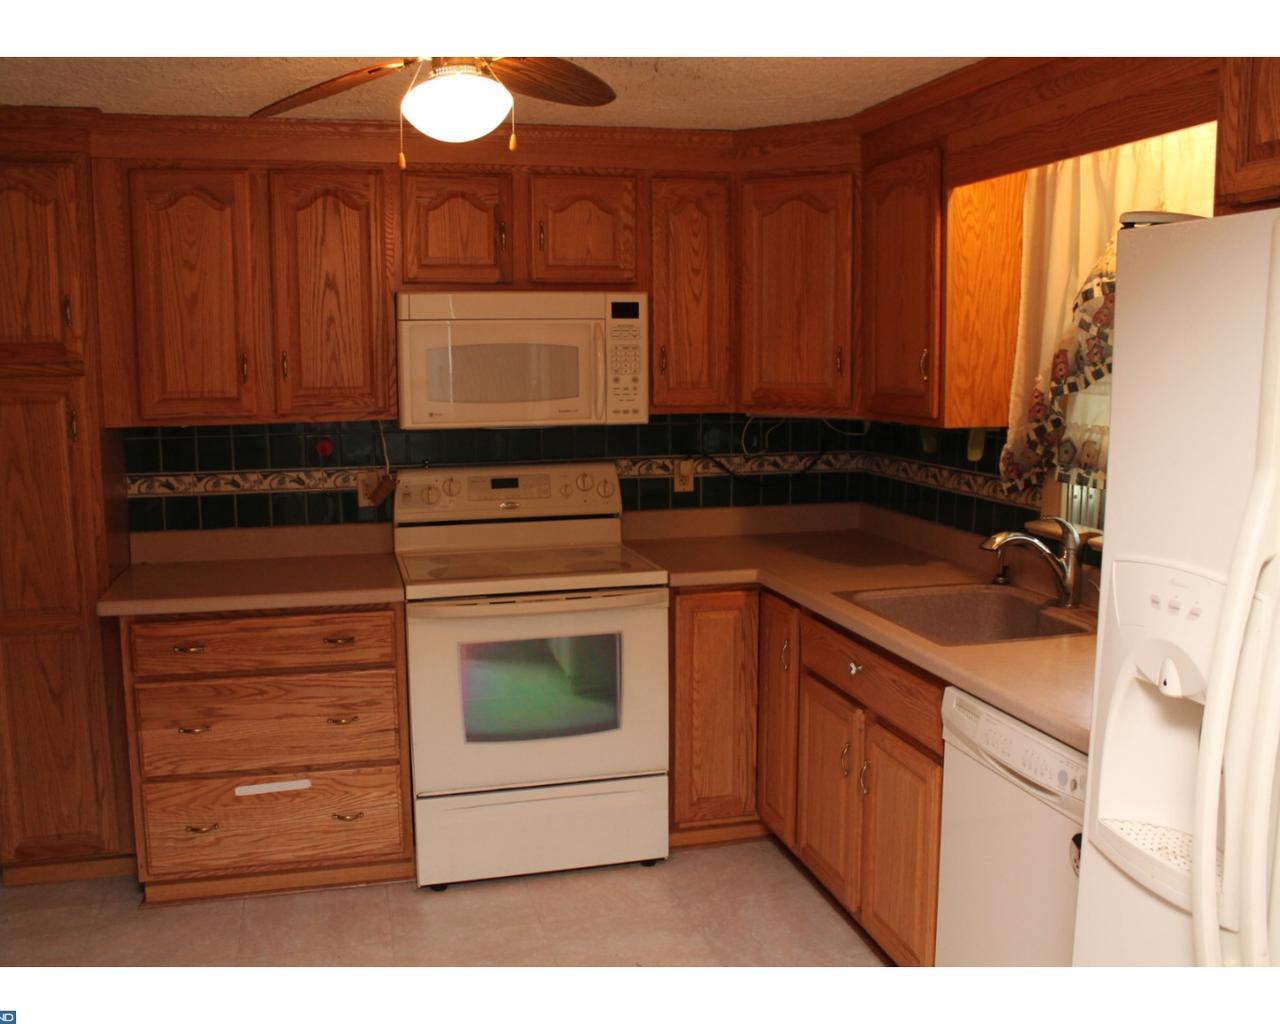 Kitchen Cabinets Quakertown Pa -